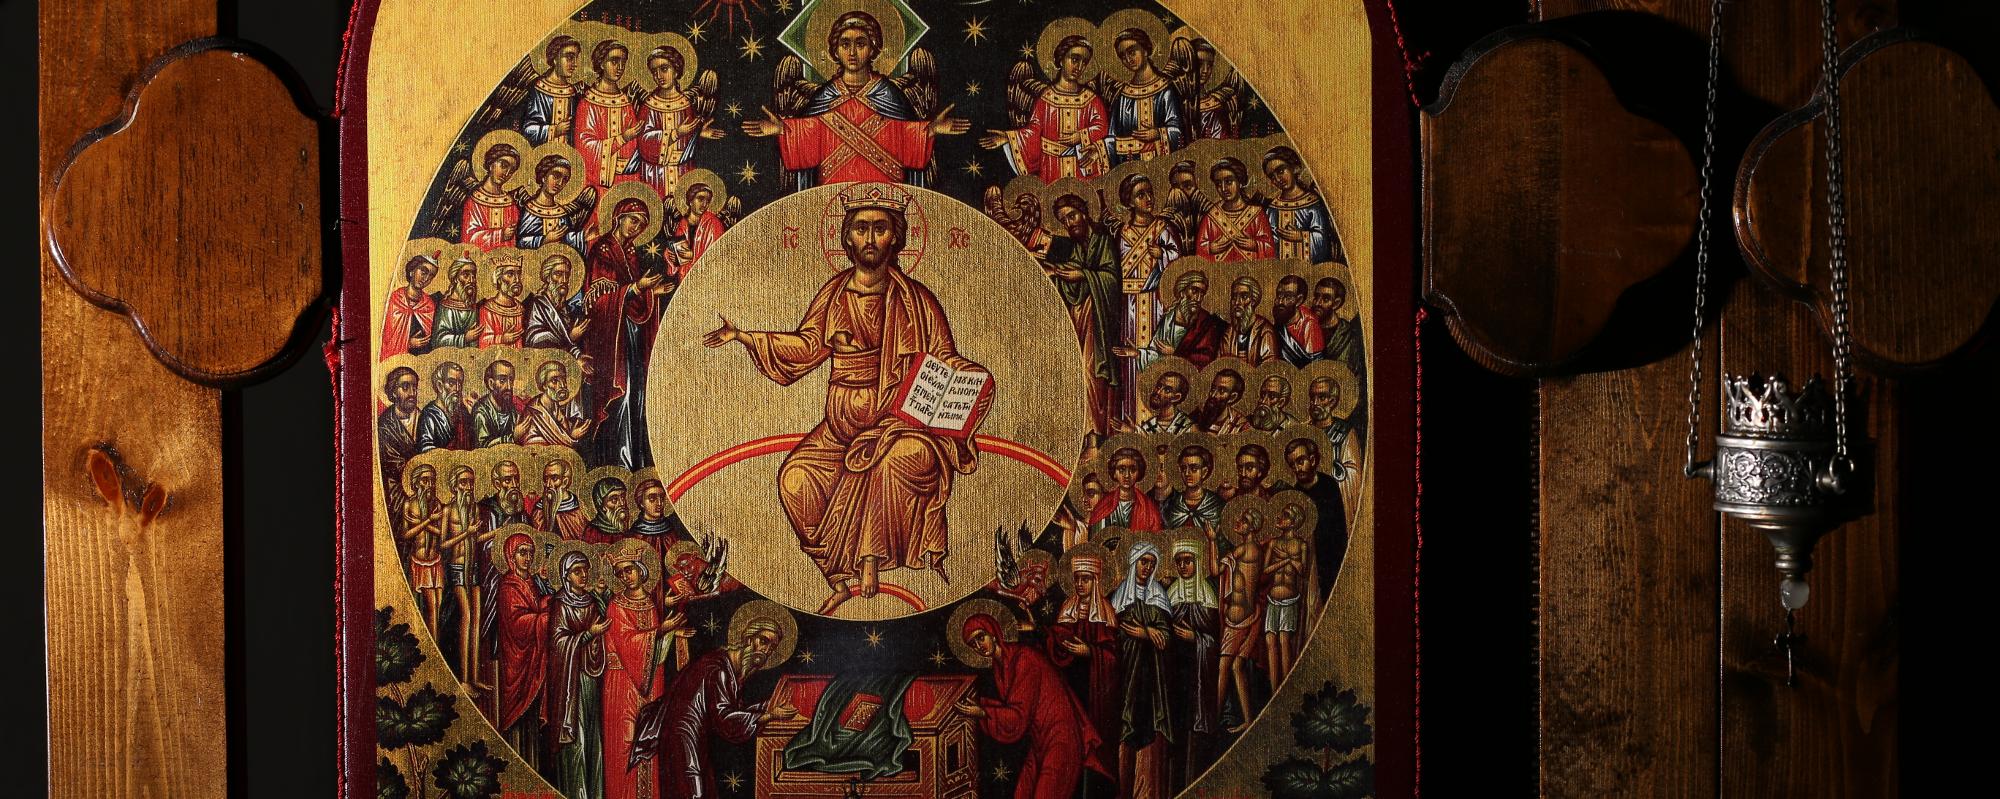 Prayer Requests – All Saints Antiochian Orthodox Church